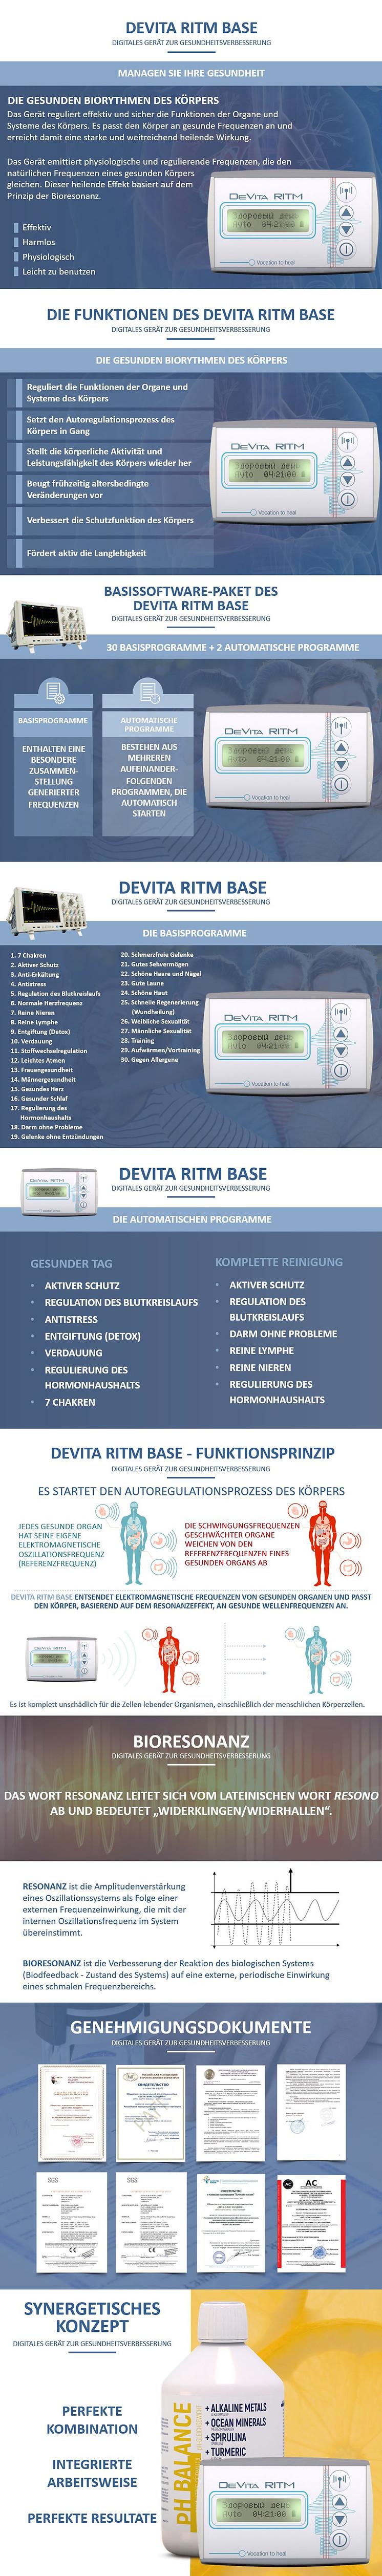 DeVita_RITM_BASE_de_DE.jpg